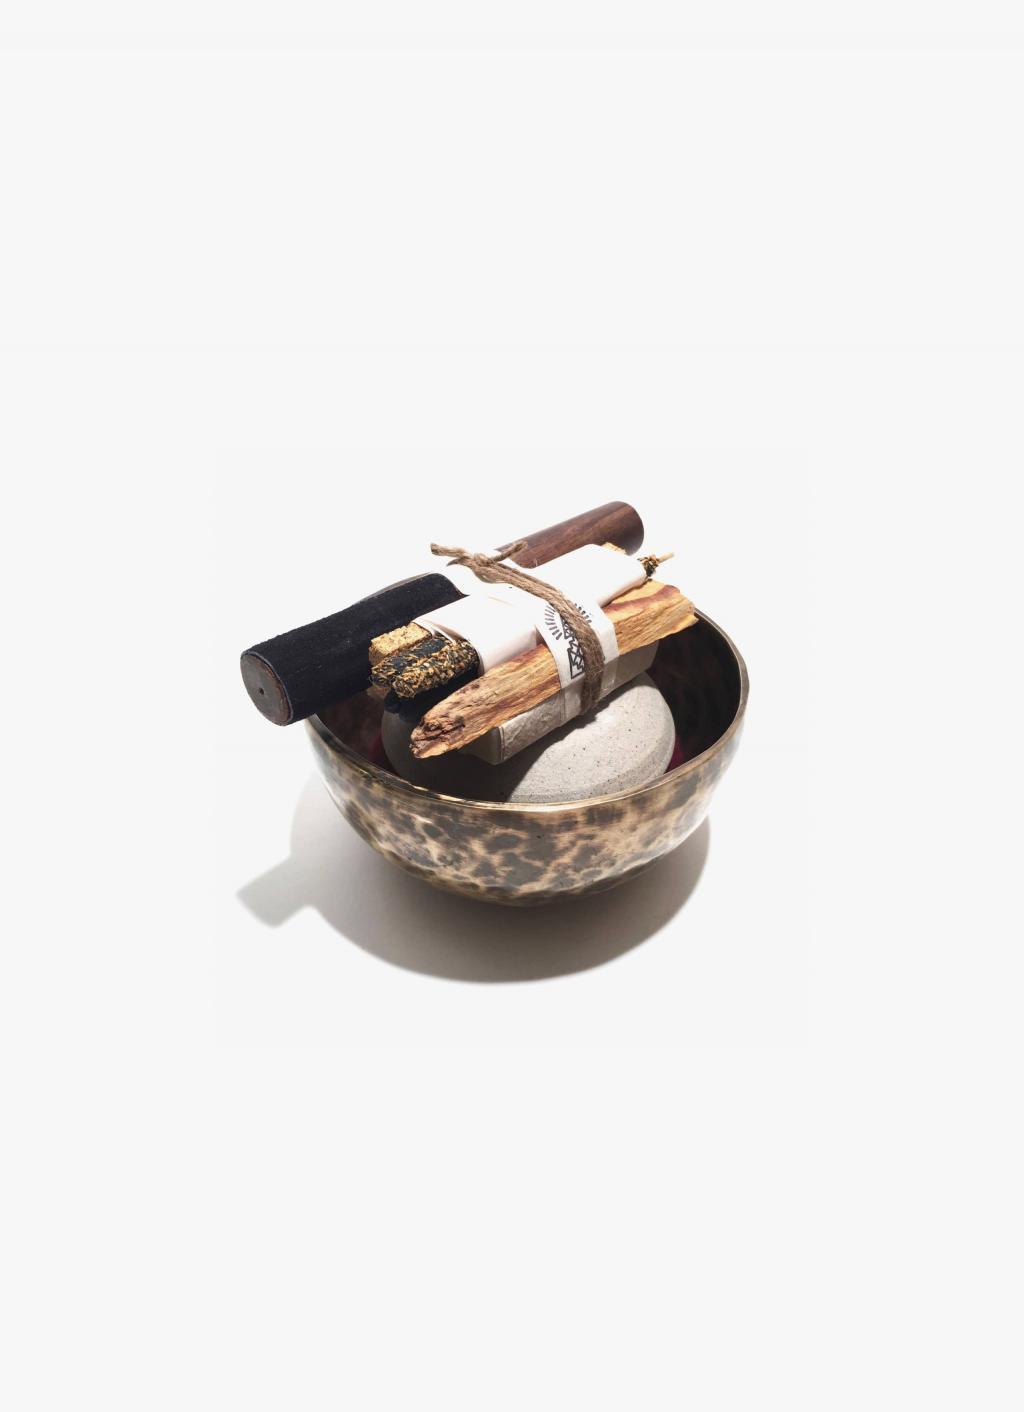 Incausa - Old fashioned Thadobati Bowl - Bath and Meditate Set